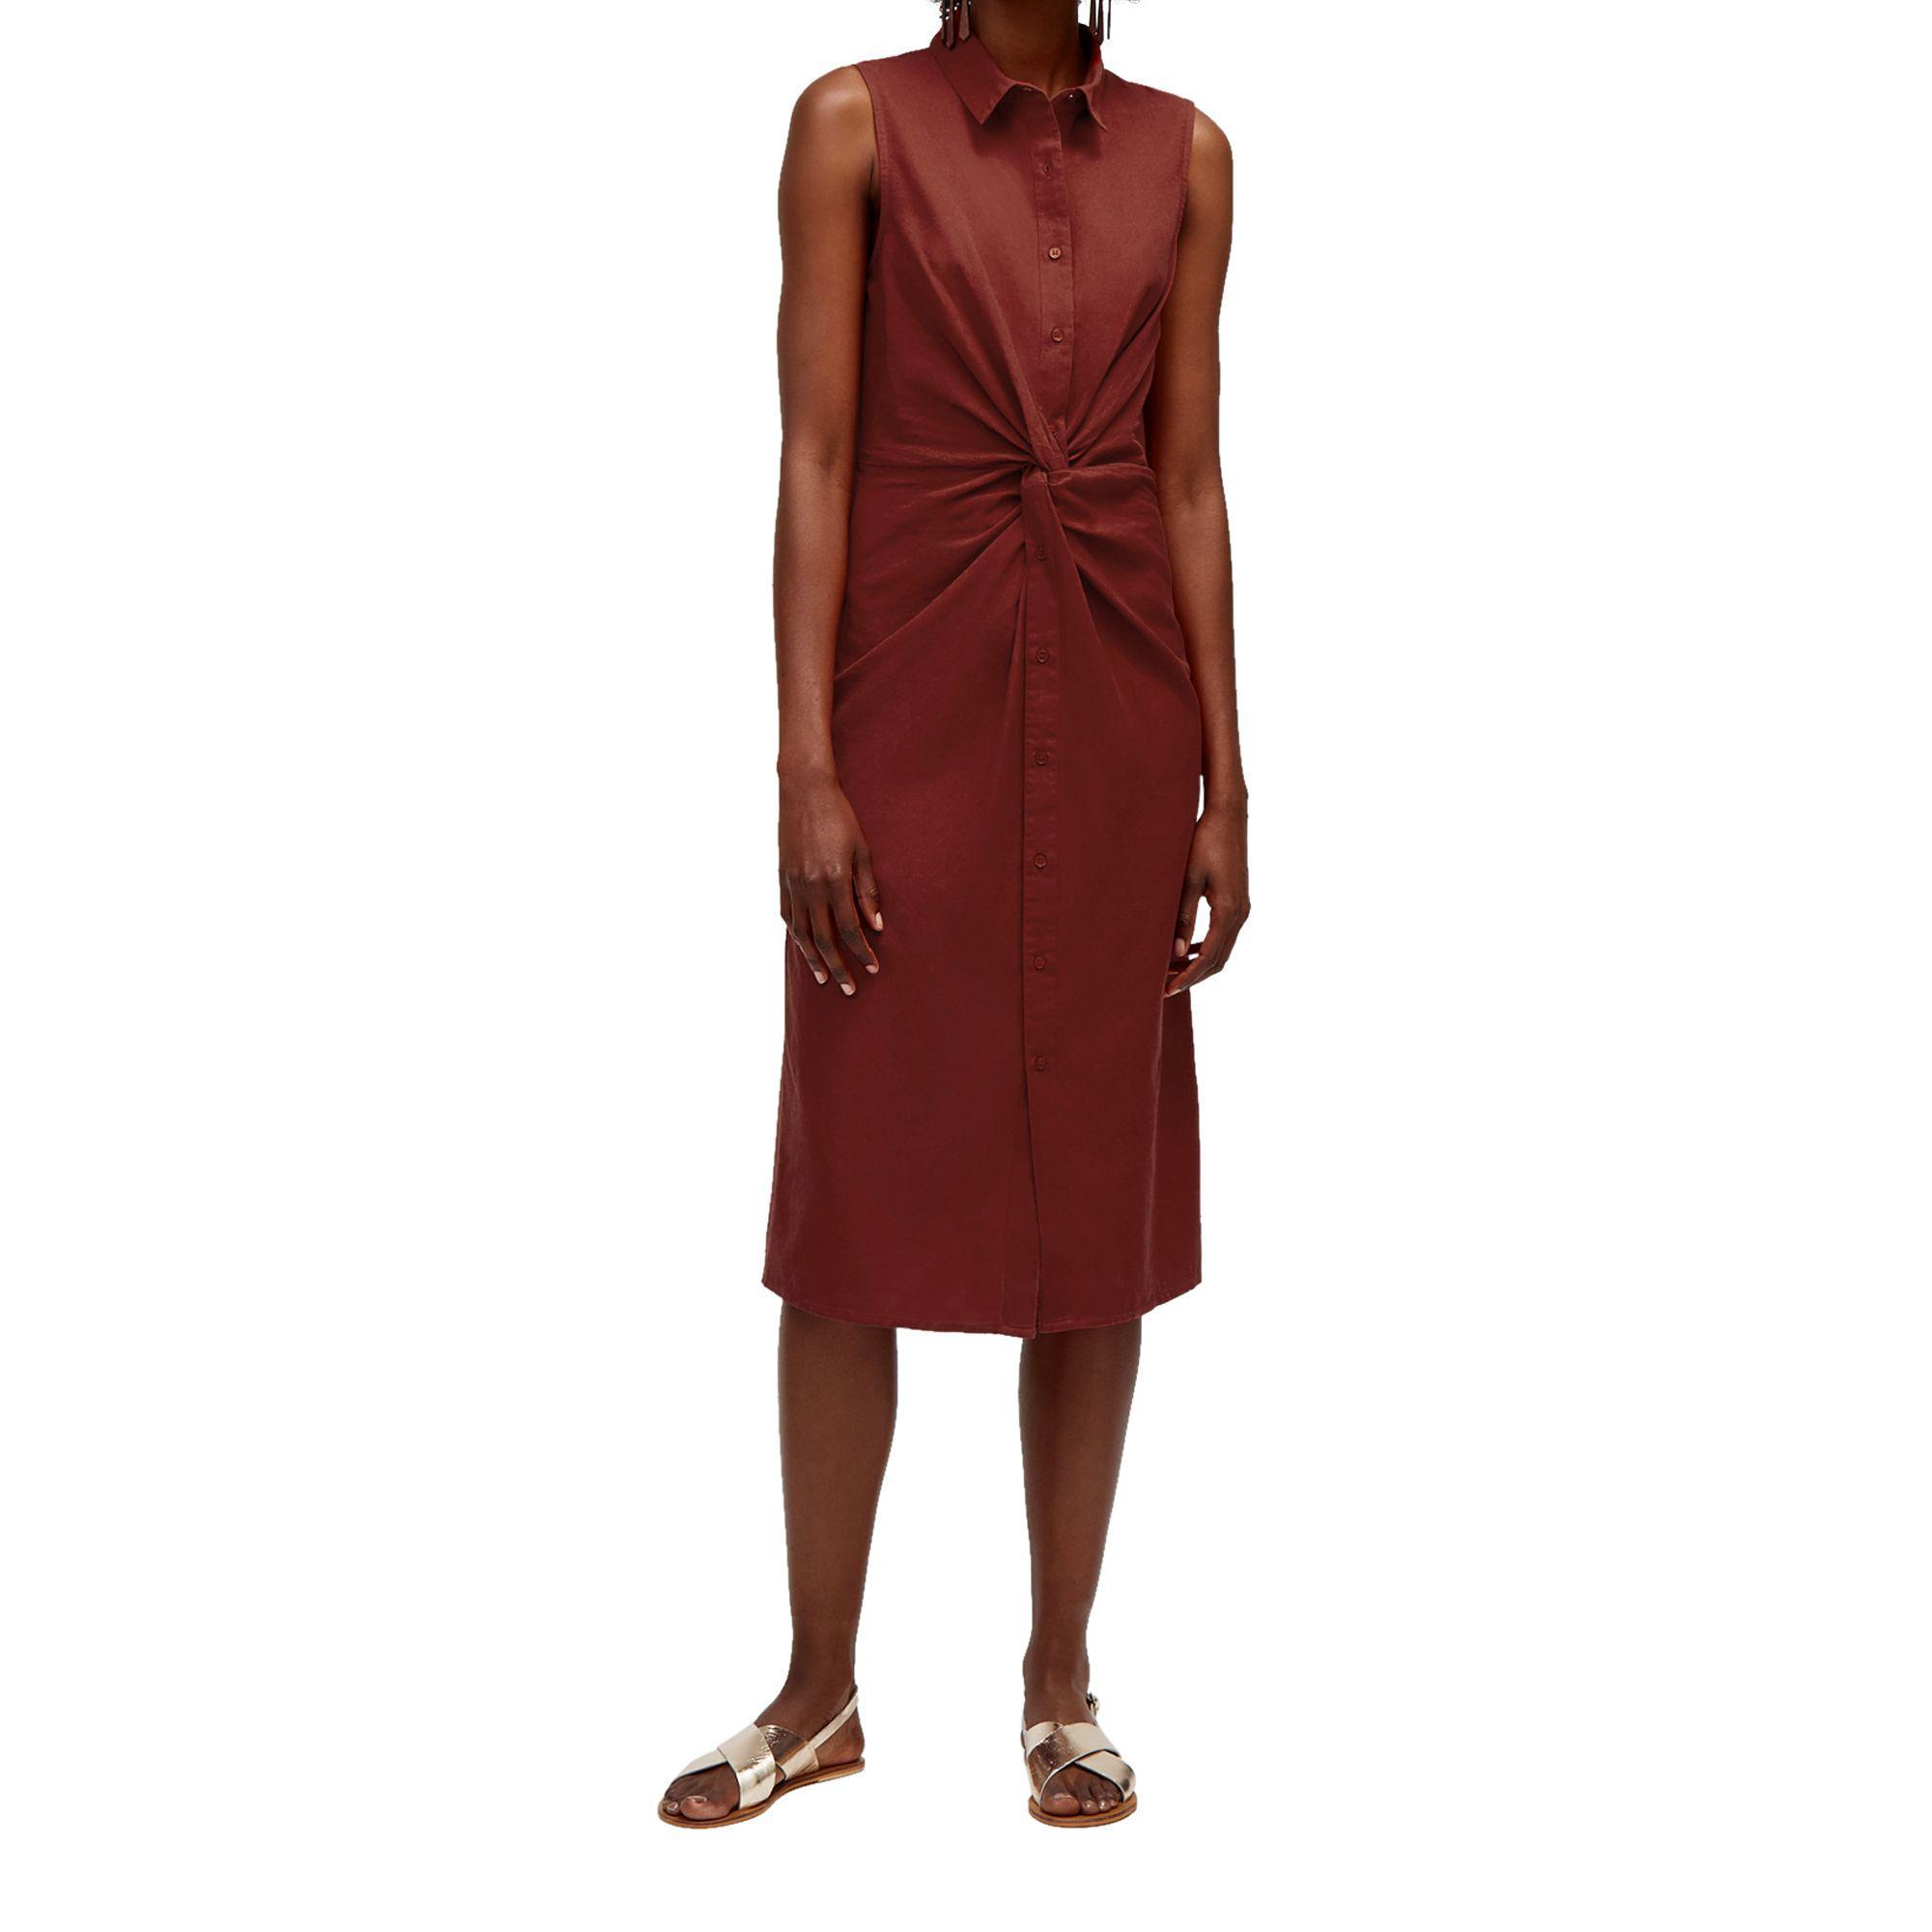 90e7f9fd69e Warehouse Linen Twist Shirt Dress in Orange - Lyst